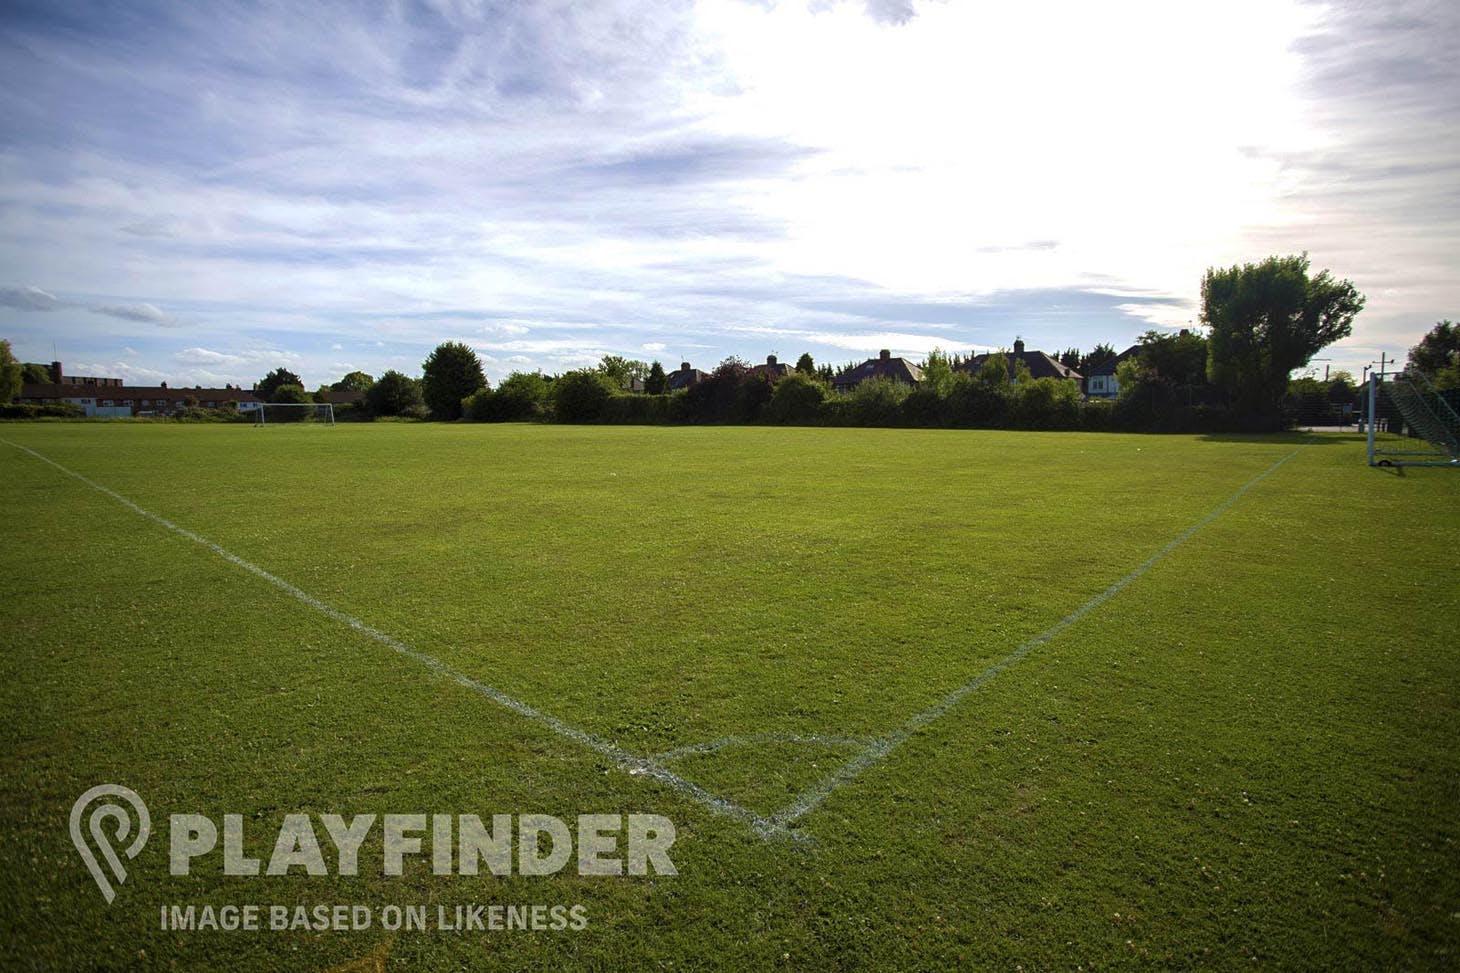 PlayFootball Aylesbury Field space hire